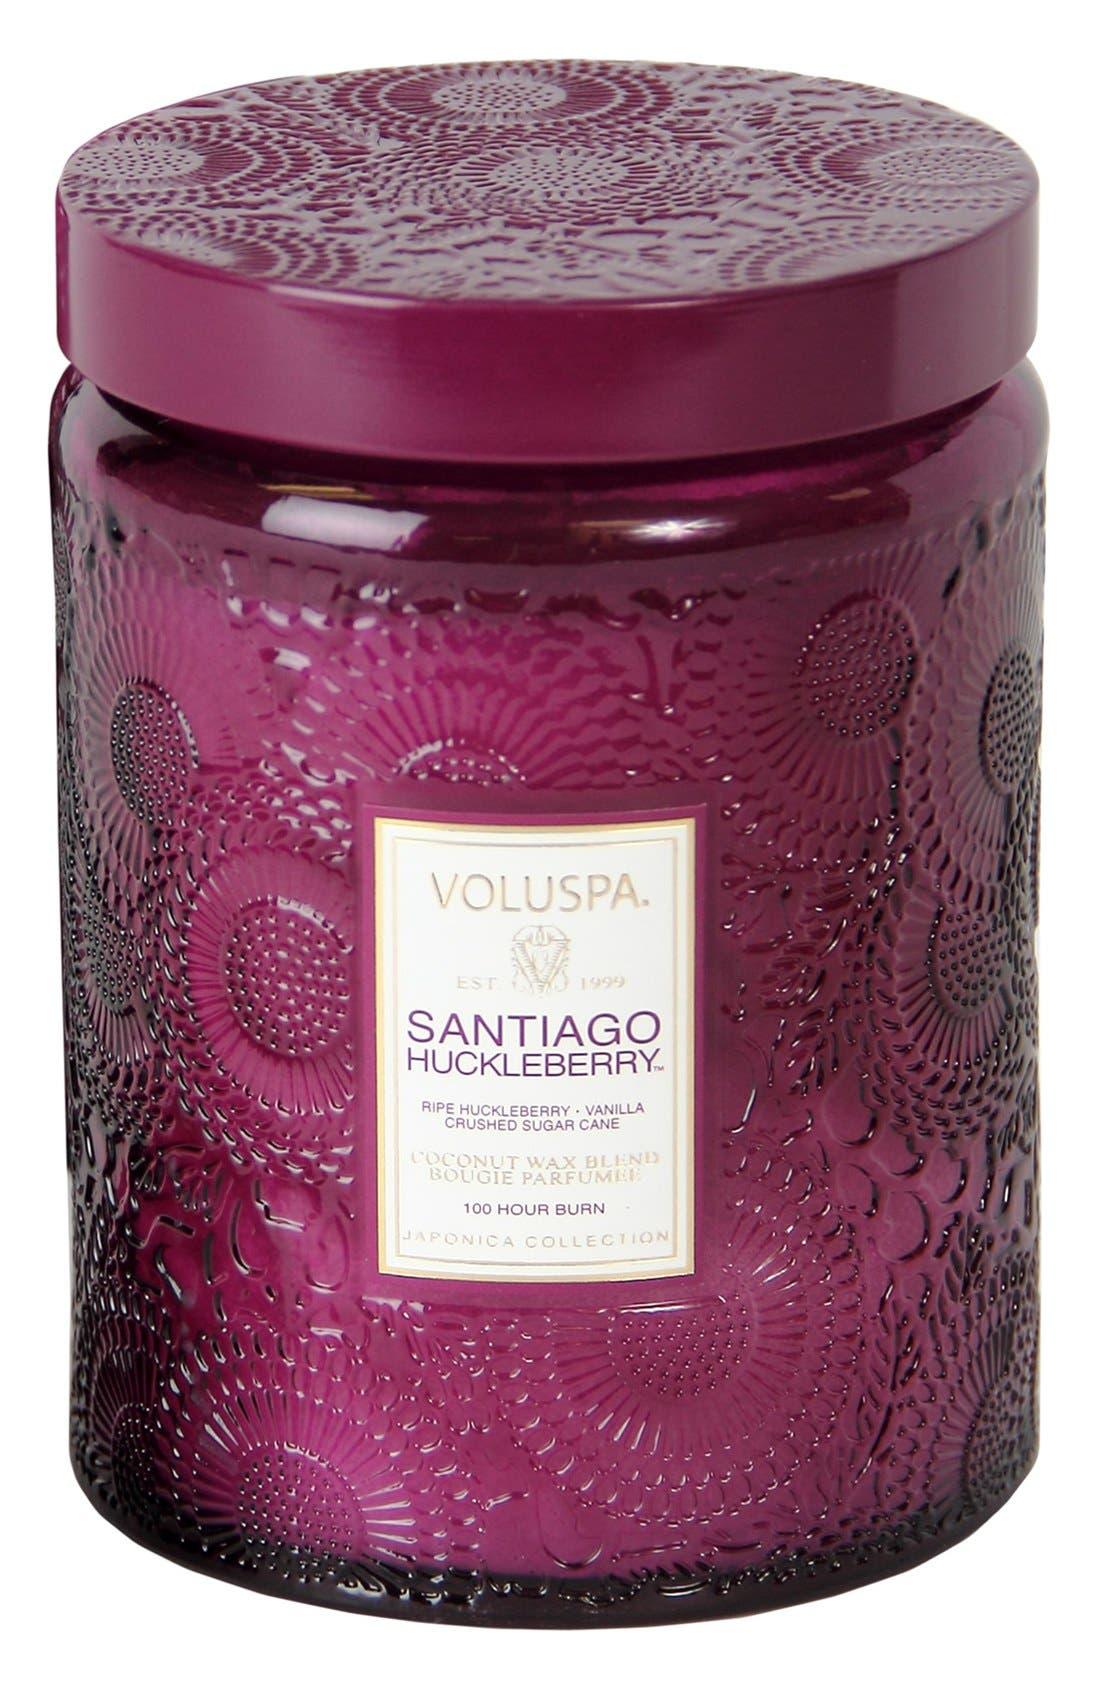 Alternate Image 1 Selected - Voluspa 'Japonica - Santiago Huckleberry' Large Embossed Jar Candle